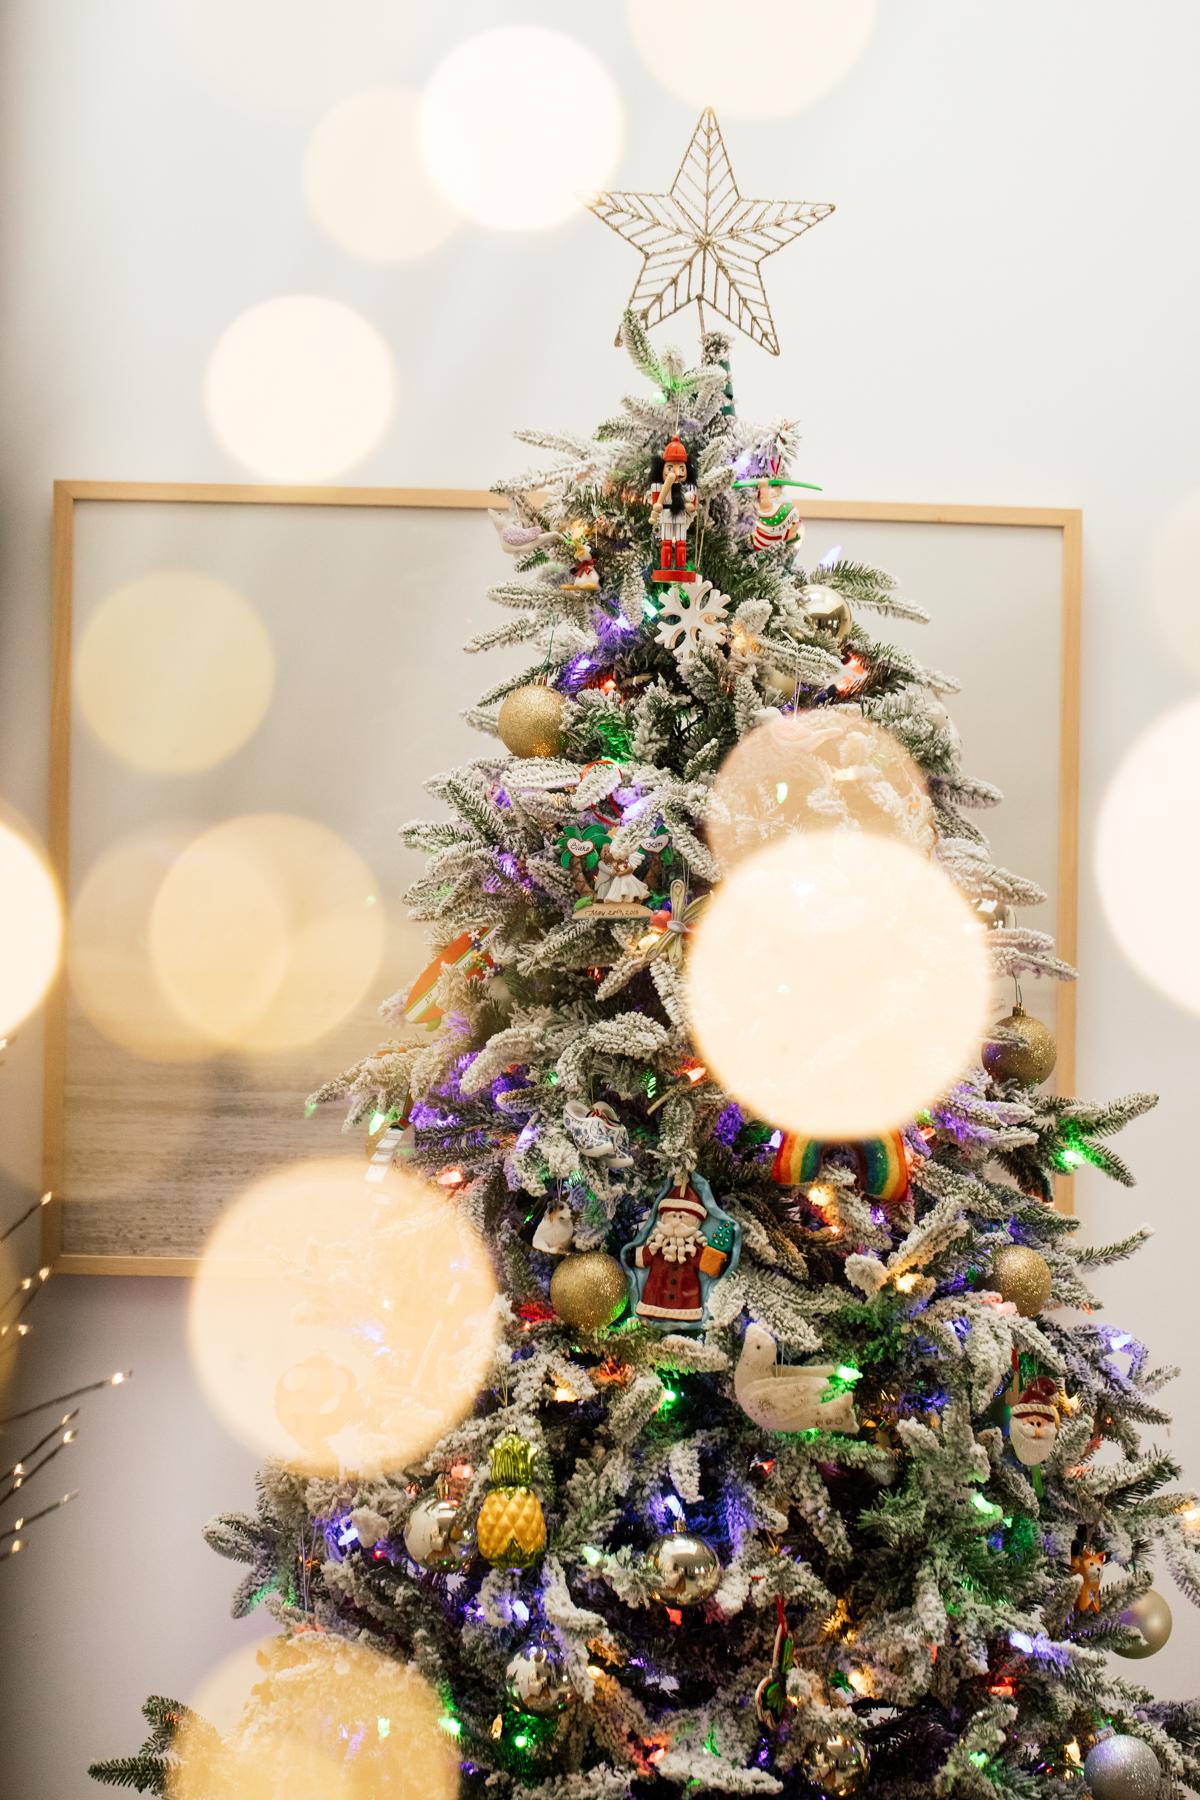 Indoor Holiday decor of lit Christmas tree